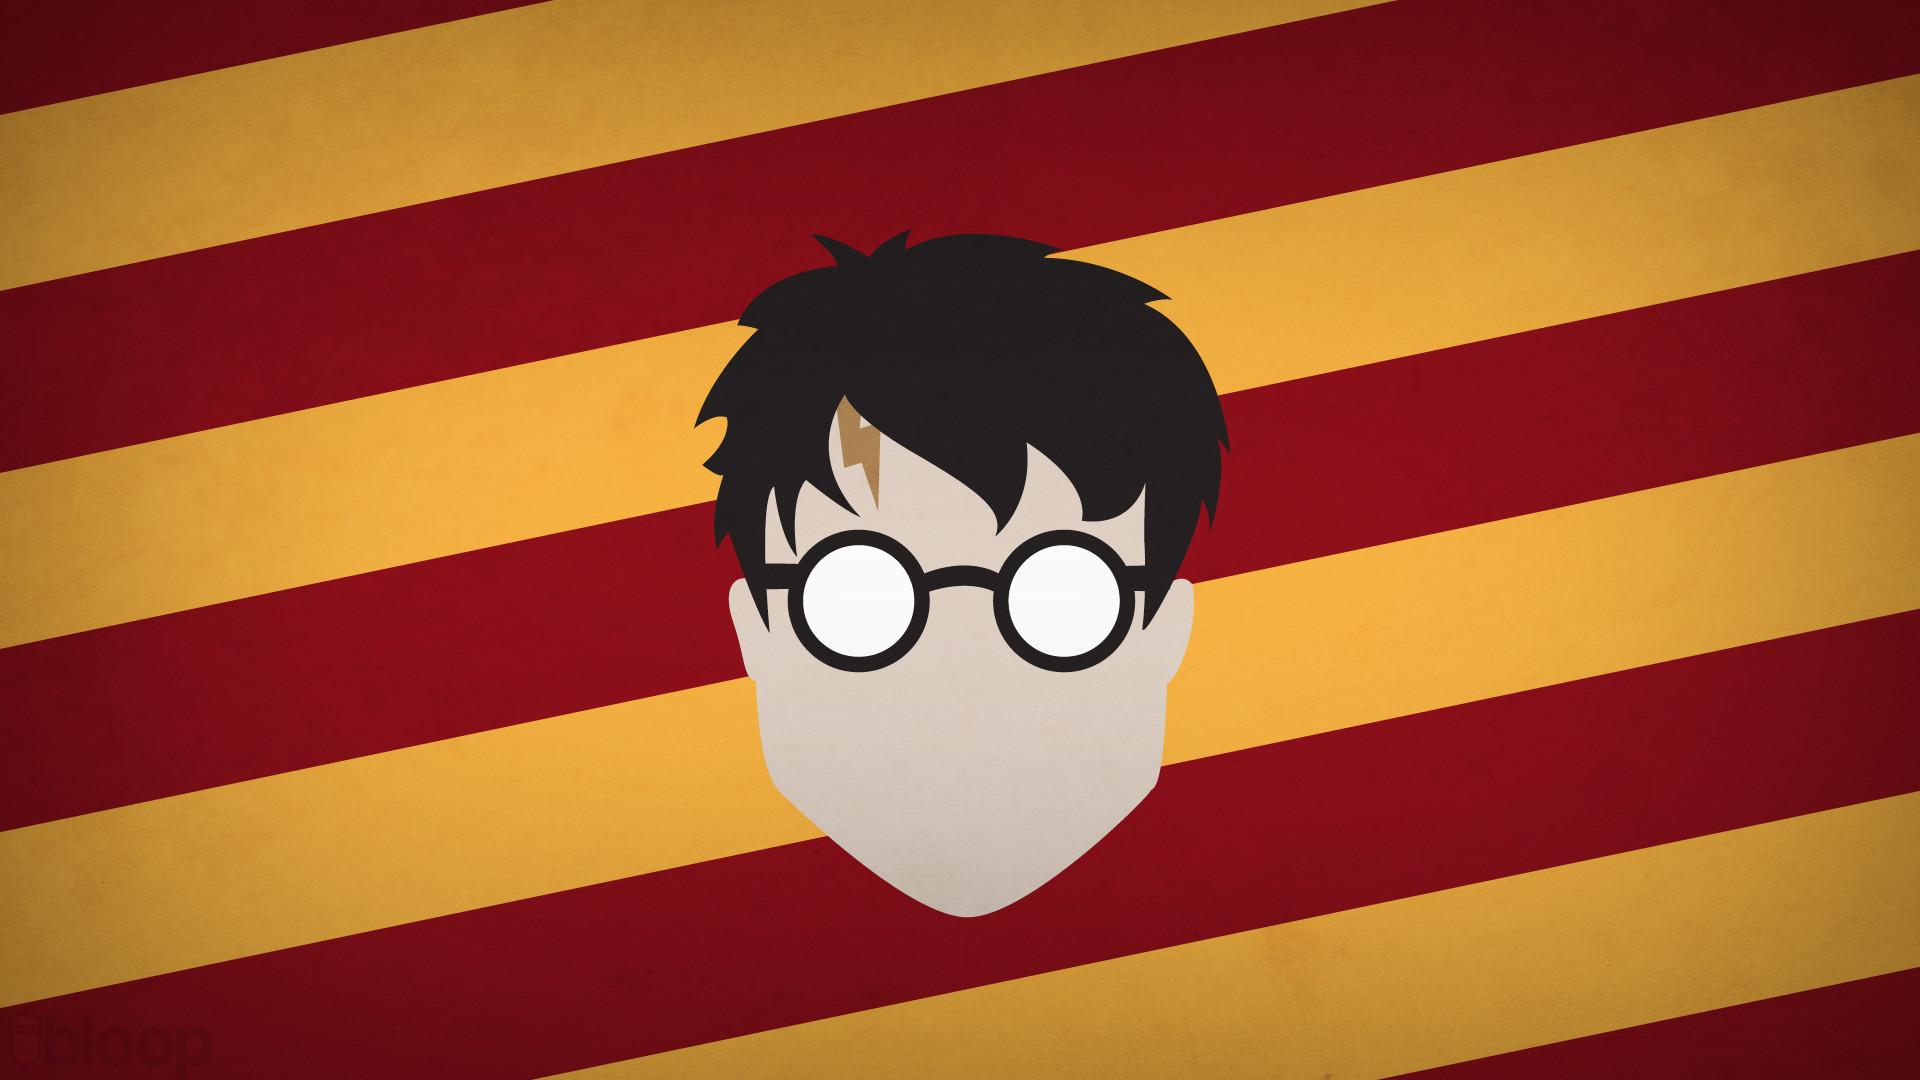 Harry potter desktop clipart